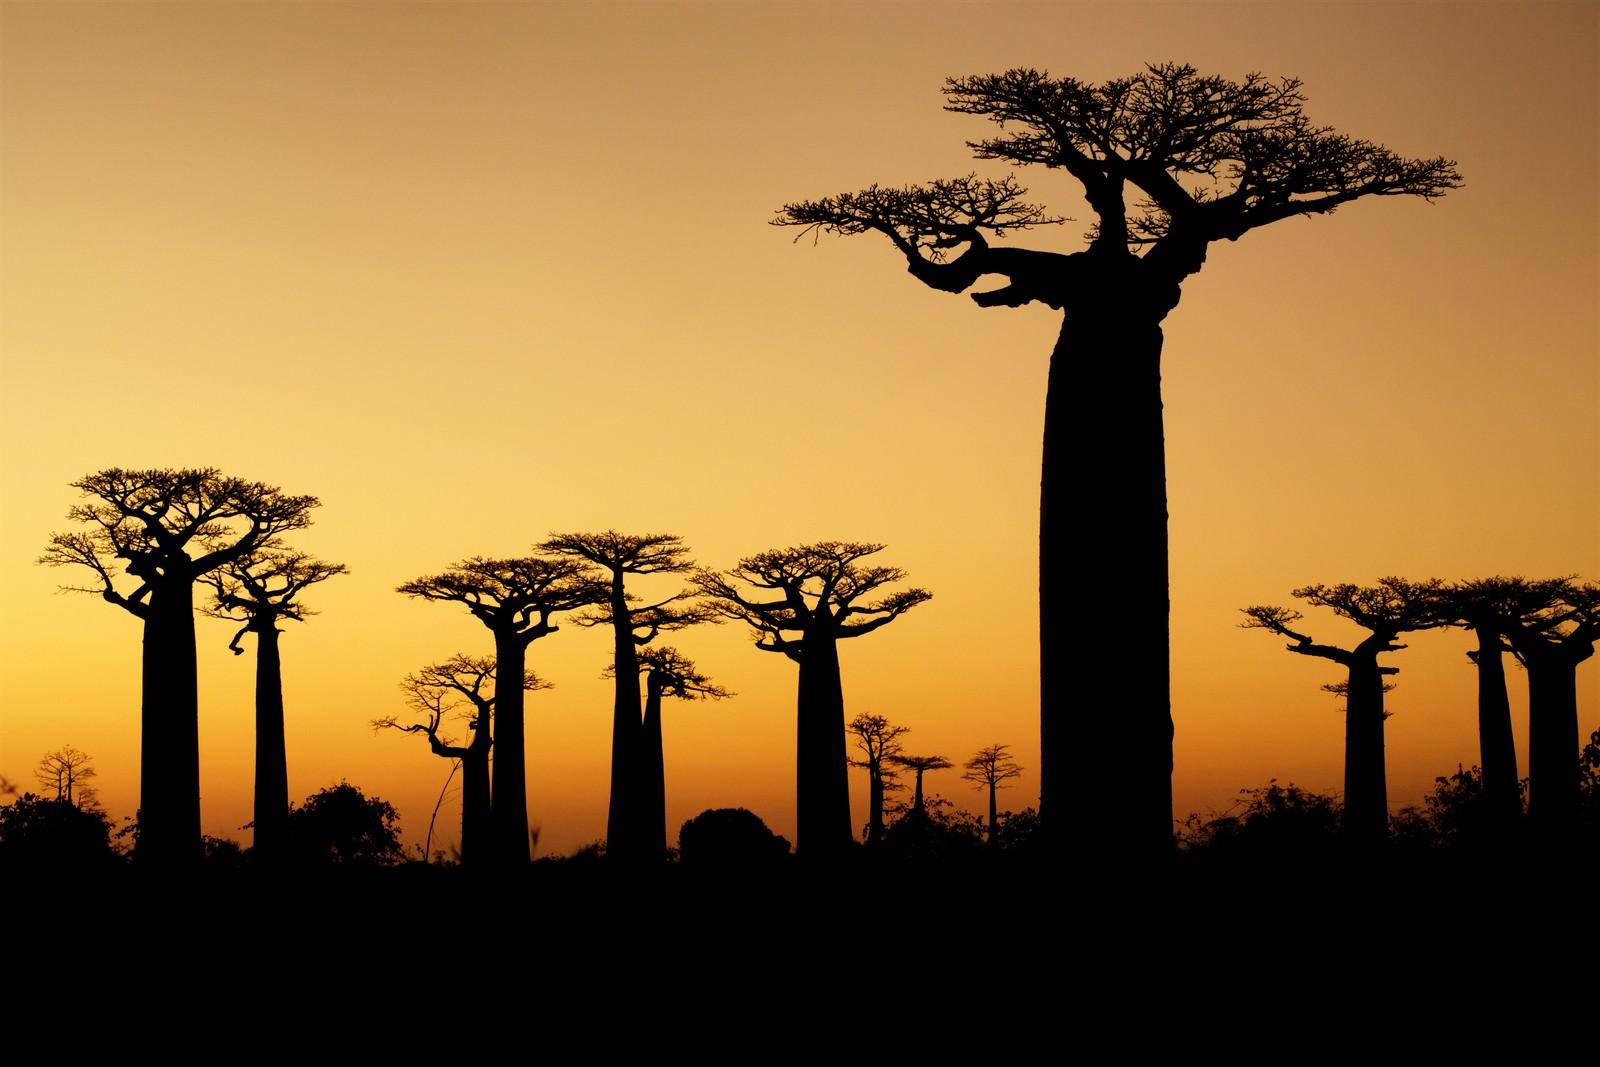 Madagascar skyline